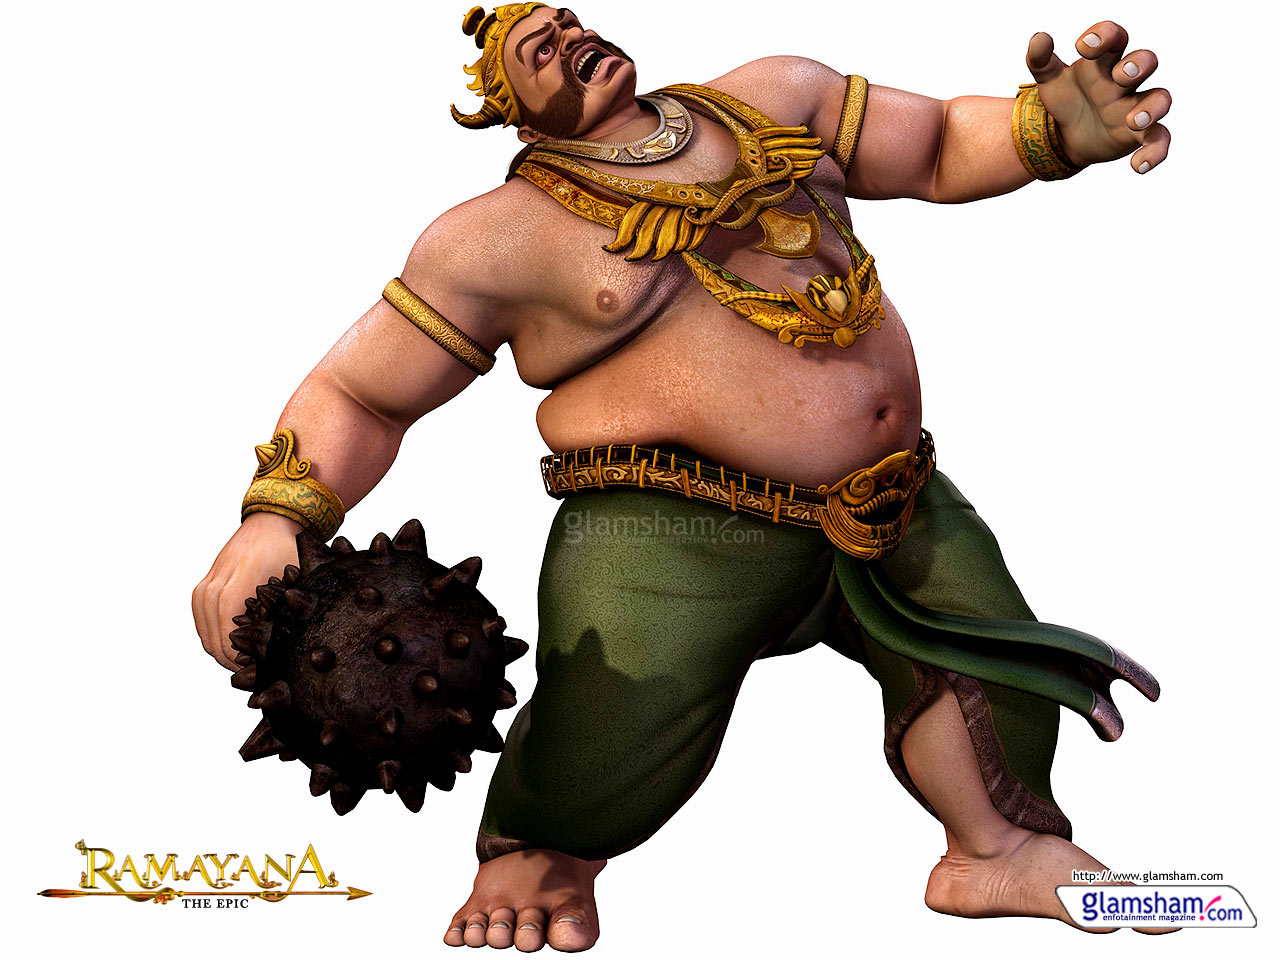 Ramayana the epic english movie animated devotional stories.